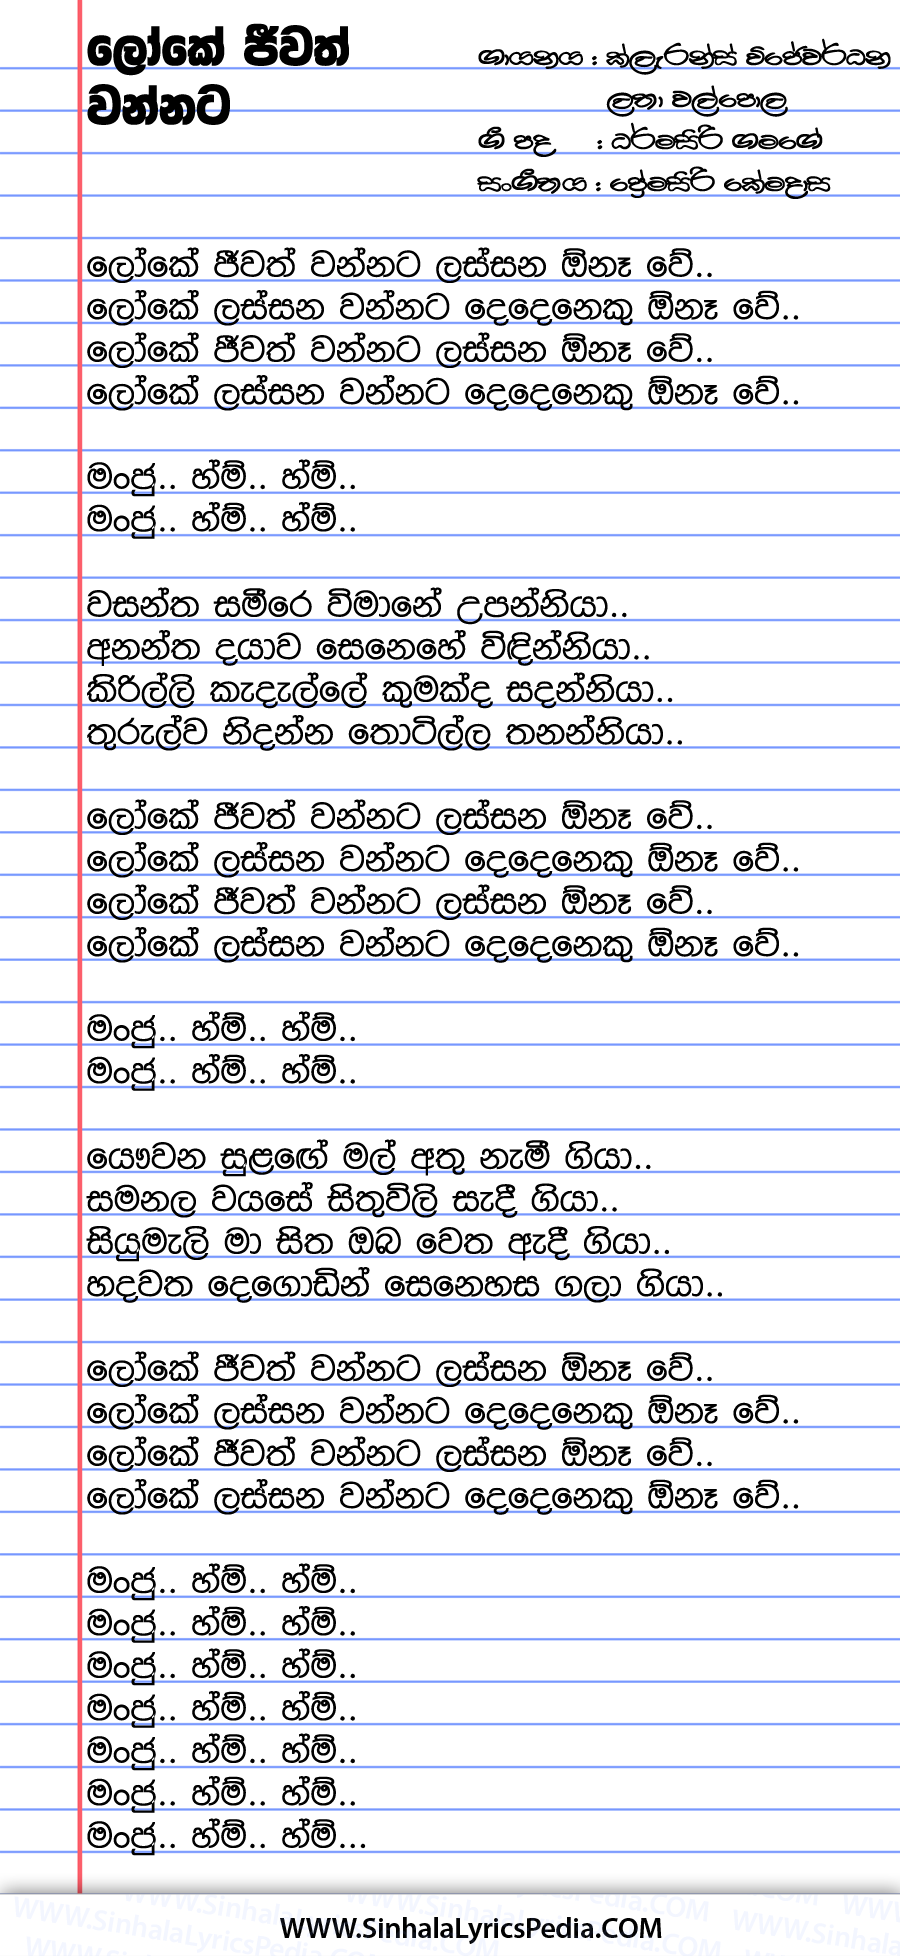 Loke Jeewath Wannata Song Lyrics